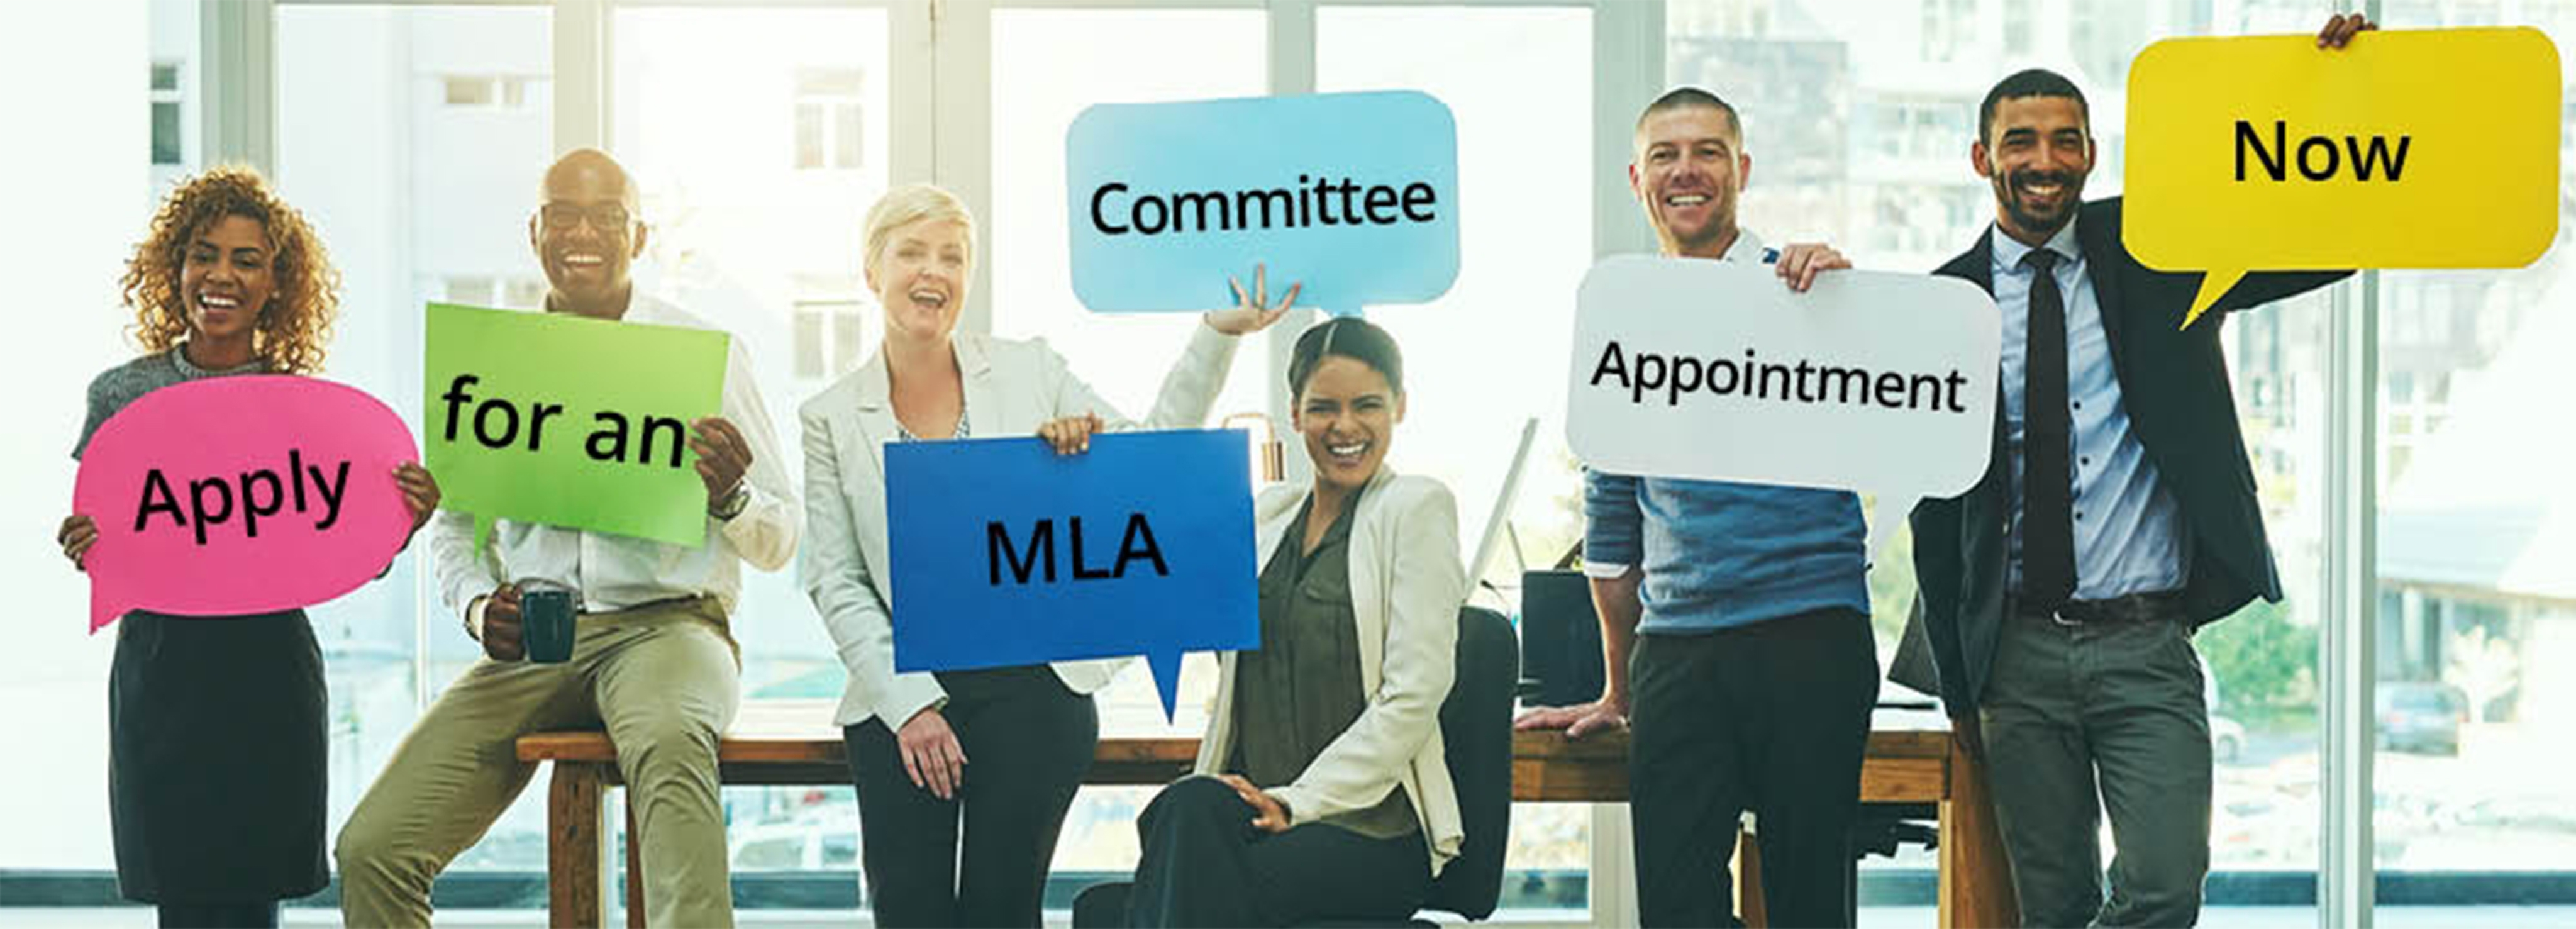 MLA Call for Volunteers